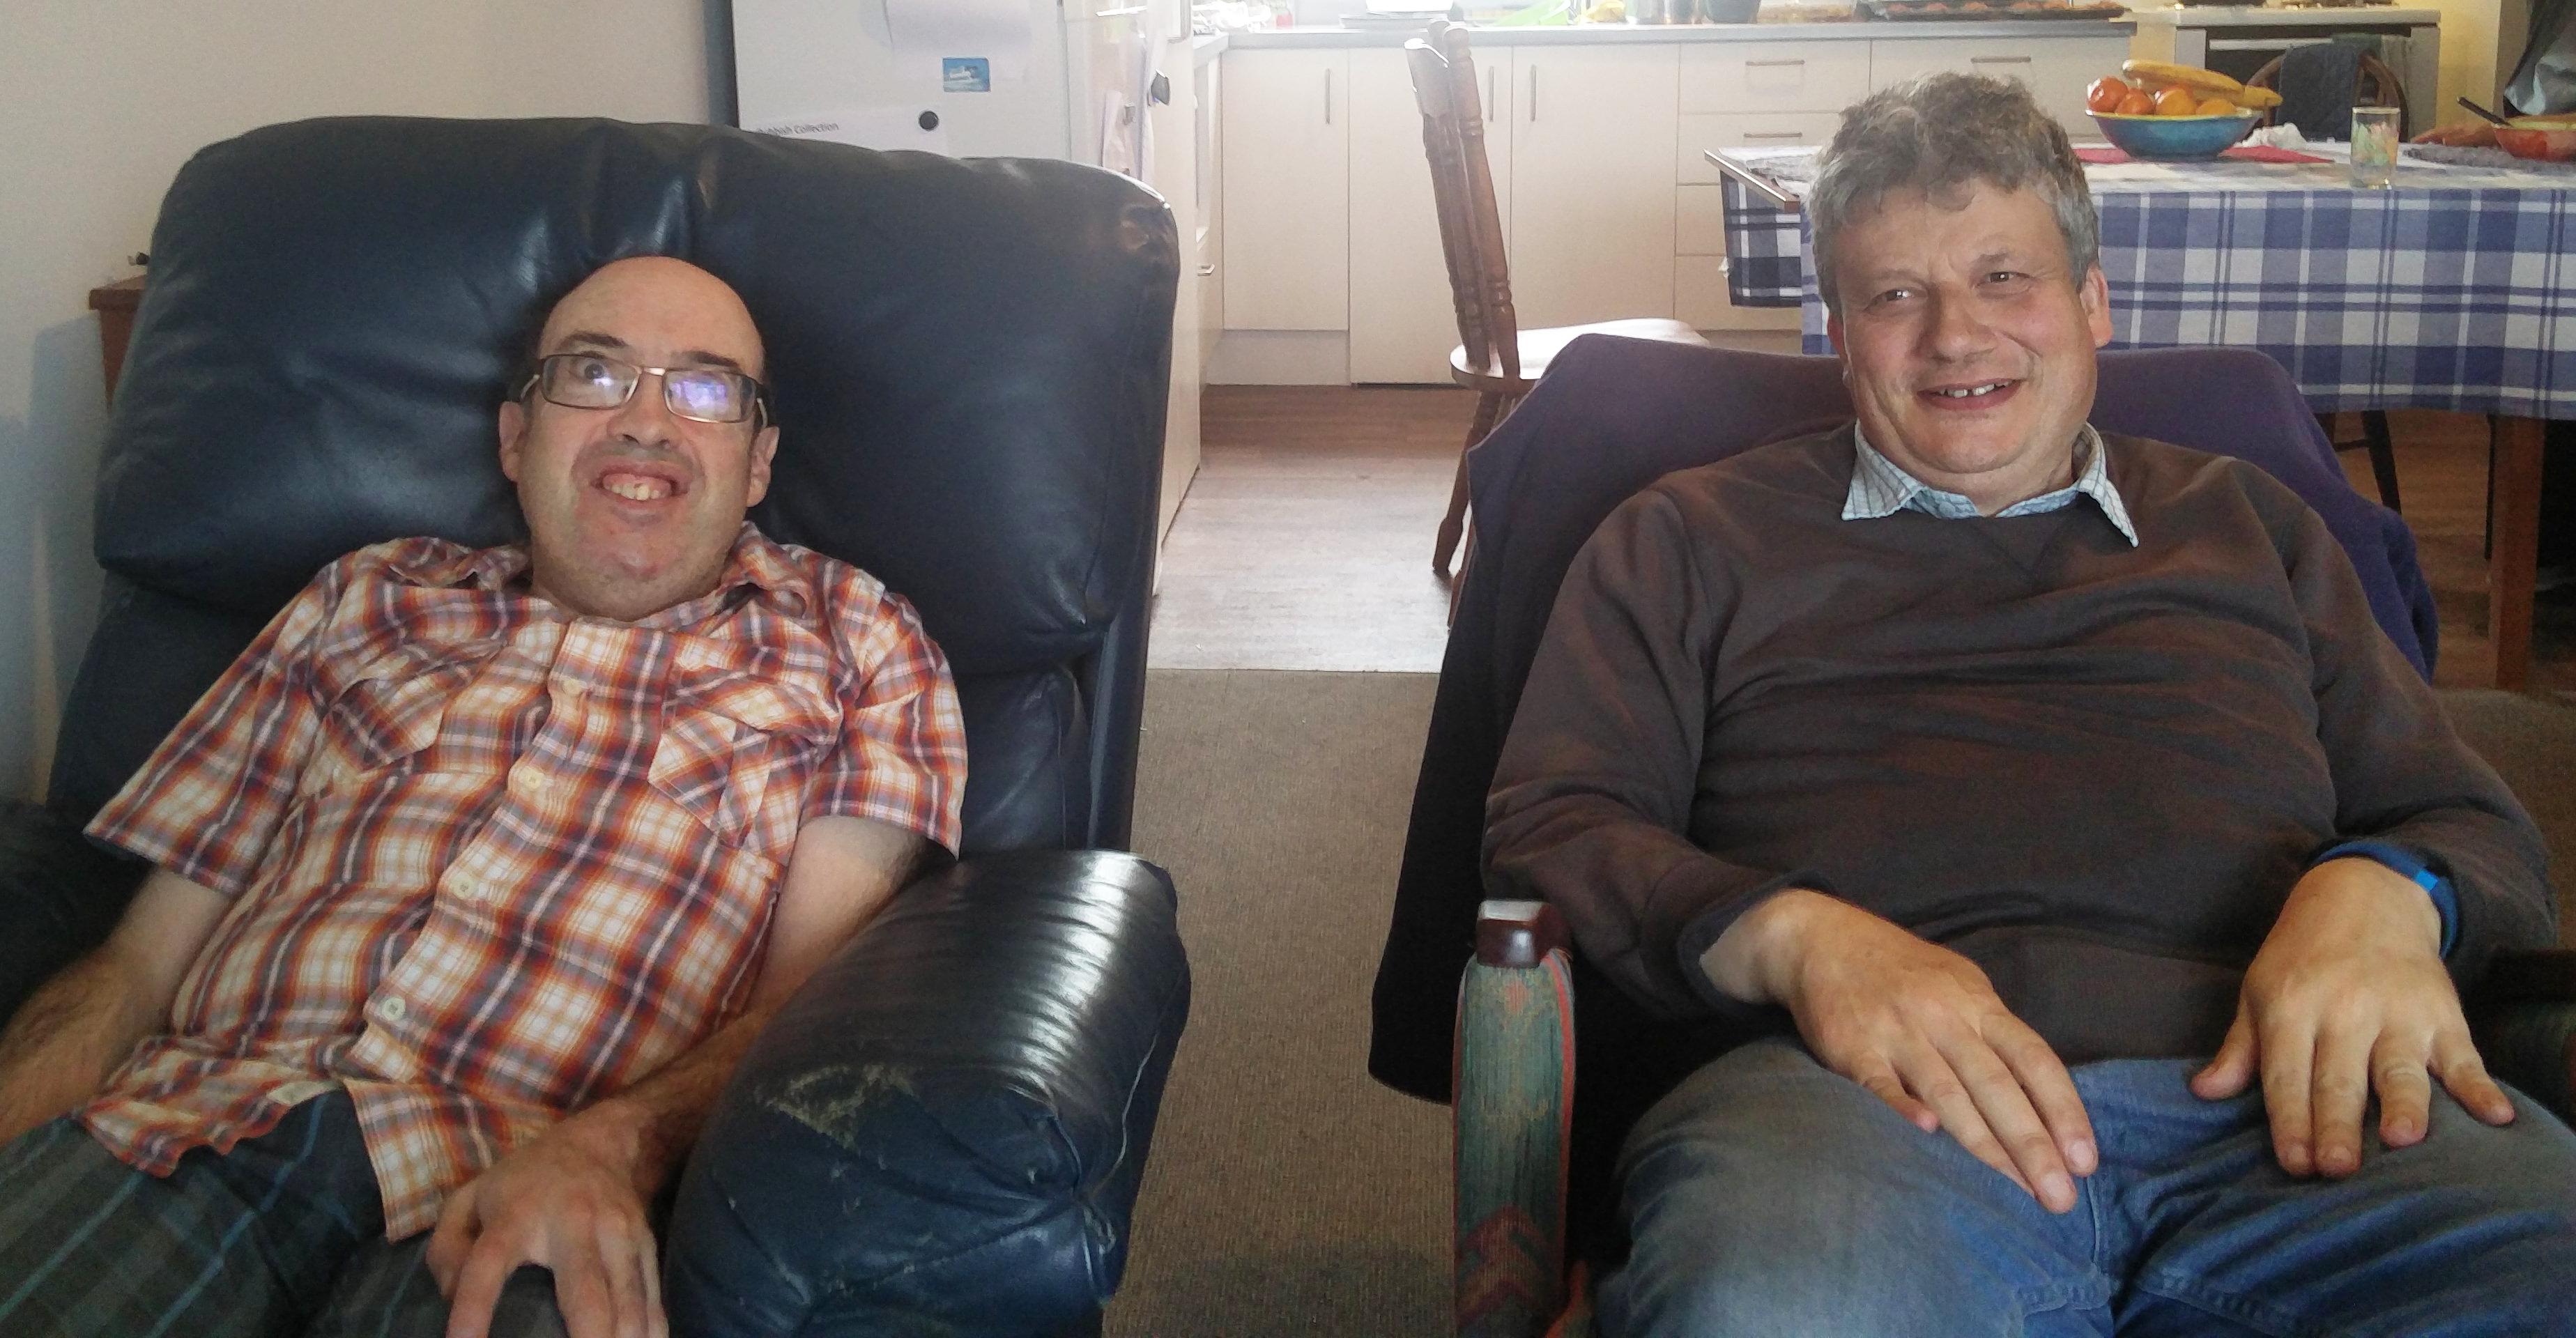 Adam Gibbs and Daniel O'Sullivan in their lounge